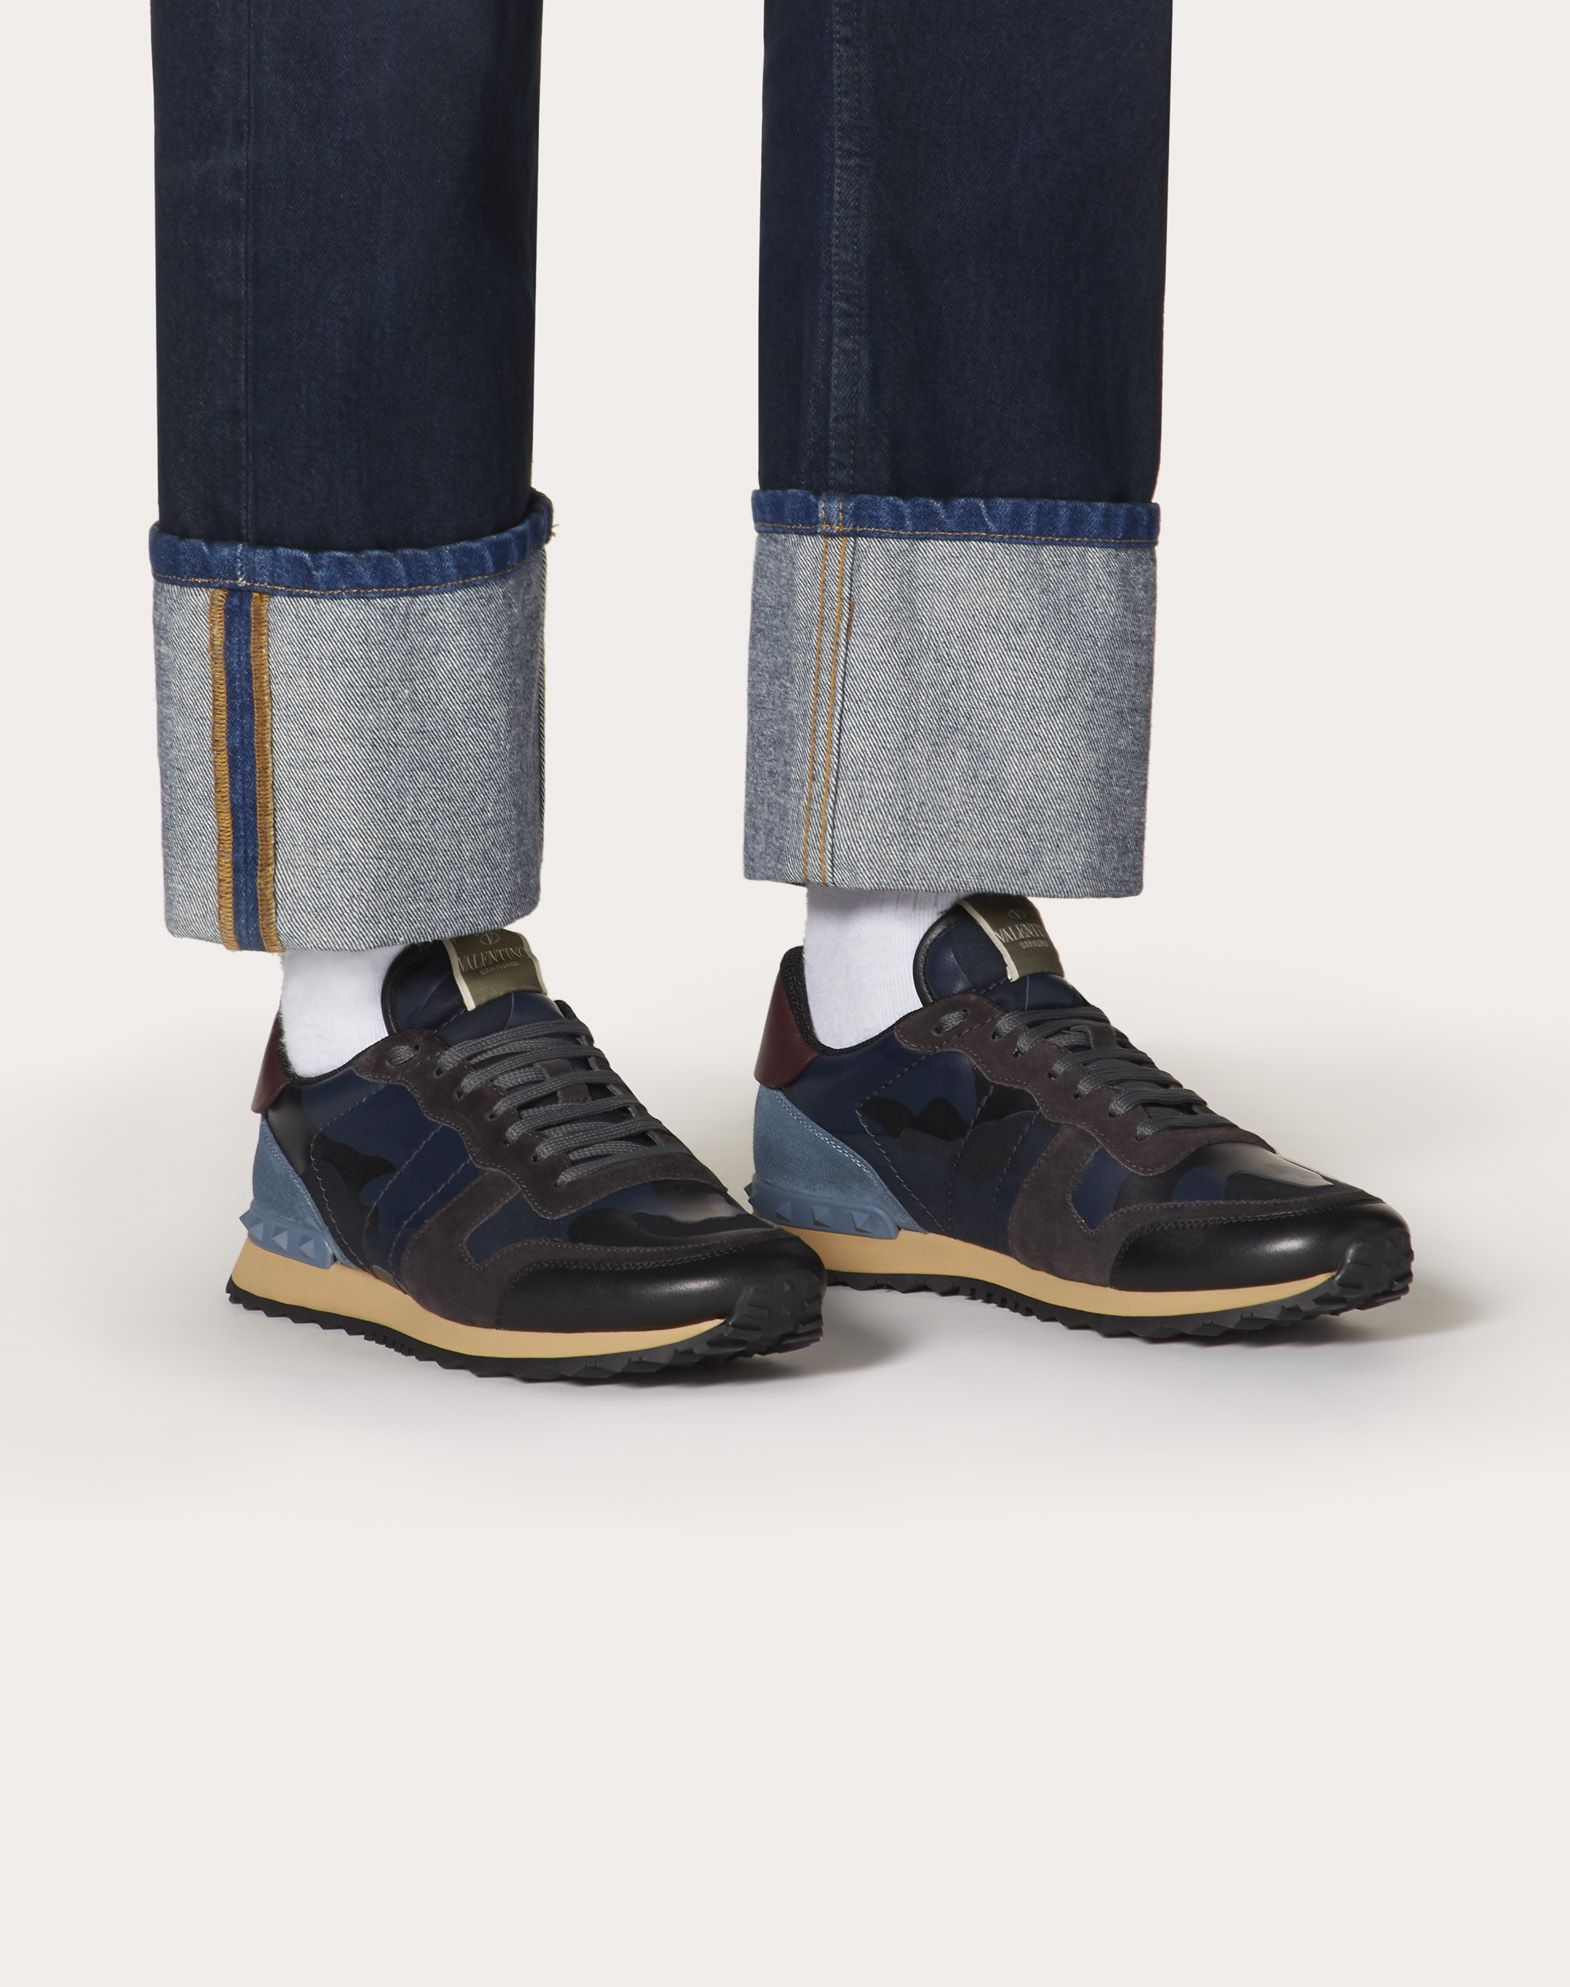 VALENTINO GARAVANI UOMO Camouflage Rockrunner Sneaker LOW-TOP SNEAKERS U b